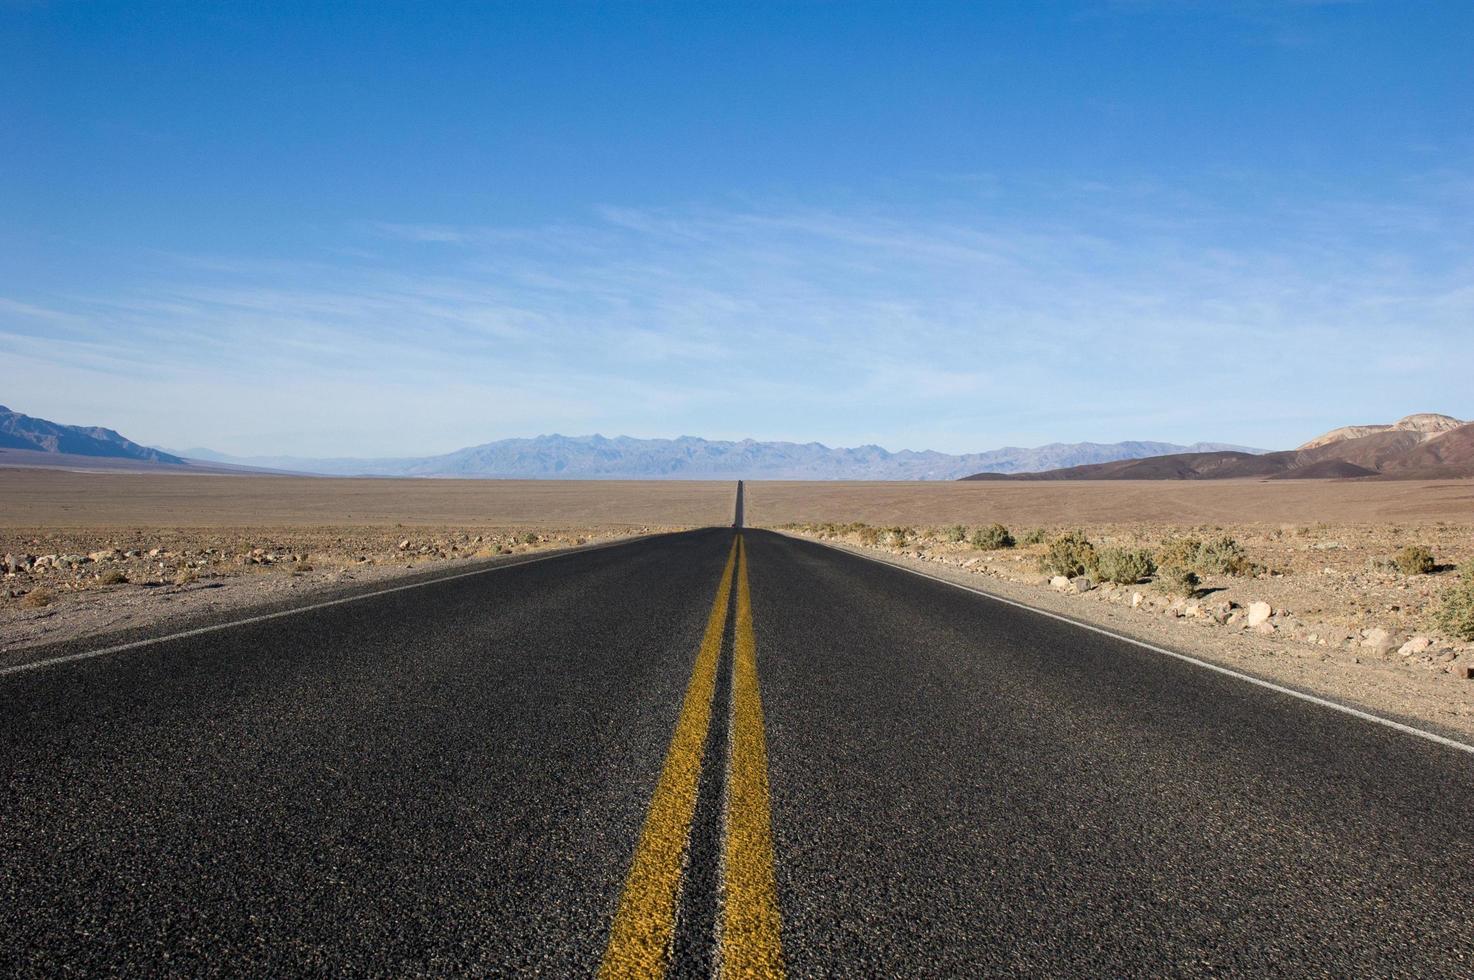 The road ahead  photo